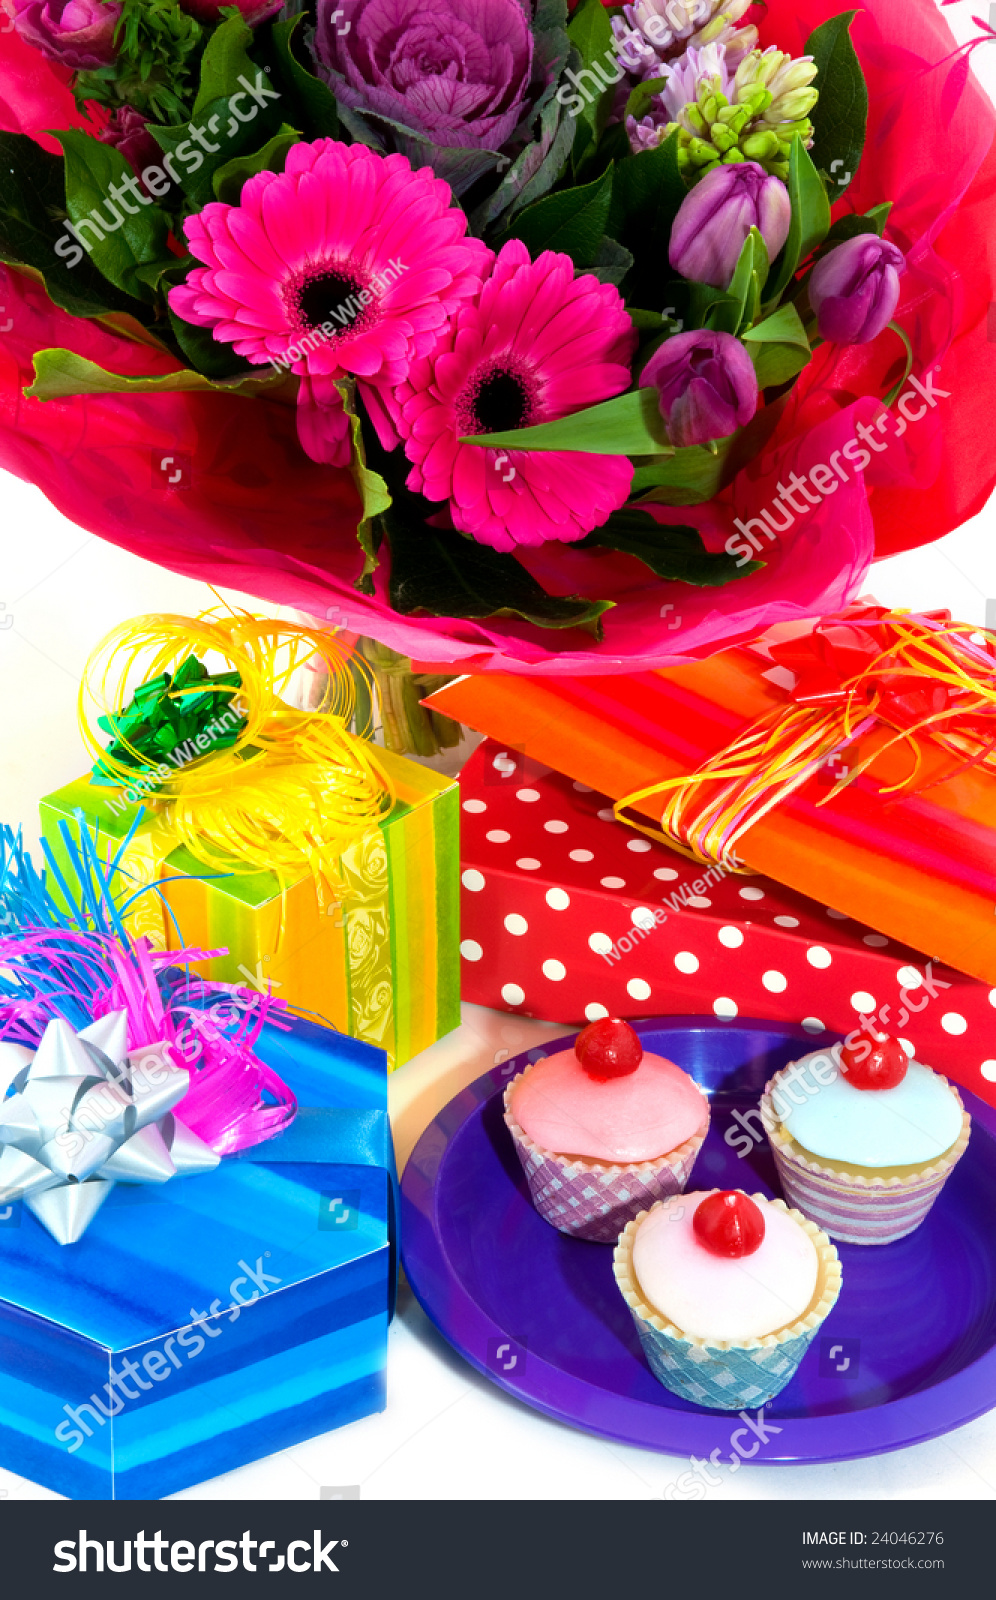 Happy birthday fancy cakes presents flowers stock photo 100 legal happy birthday with fancy cakes presents and flowers izmirmasajfo